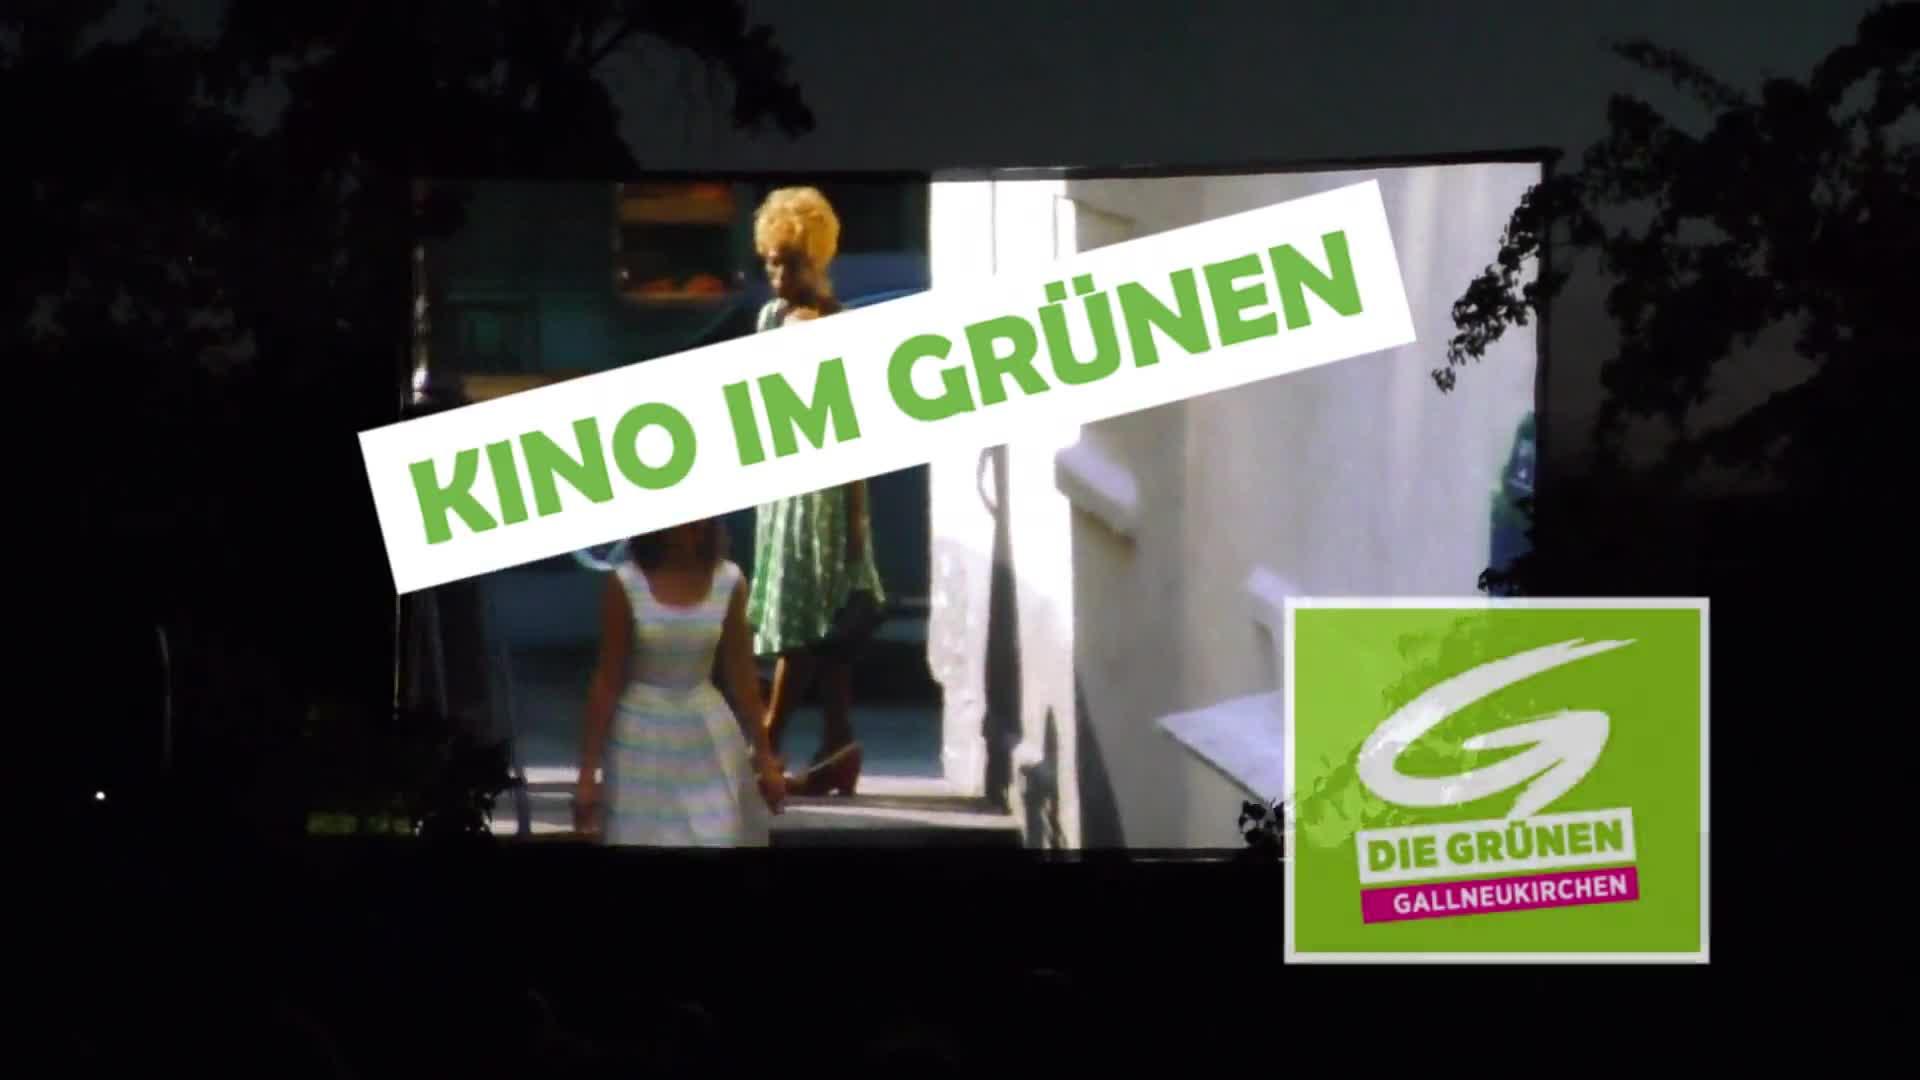 Kino im Grünen